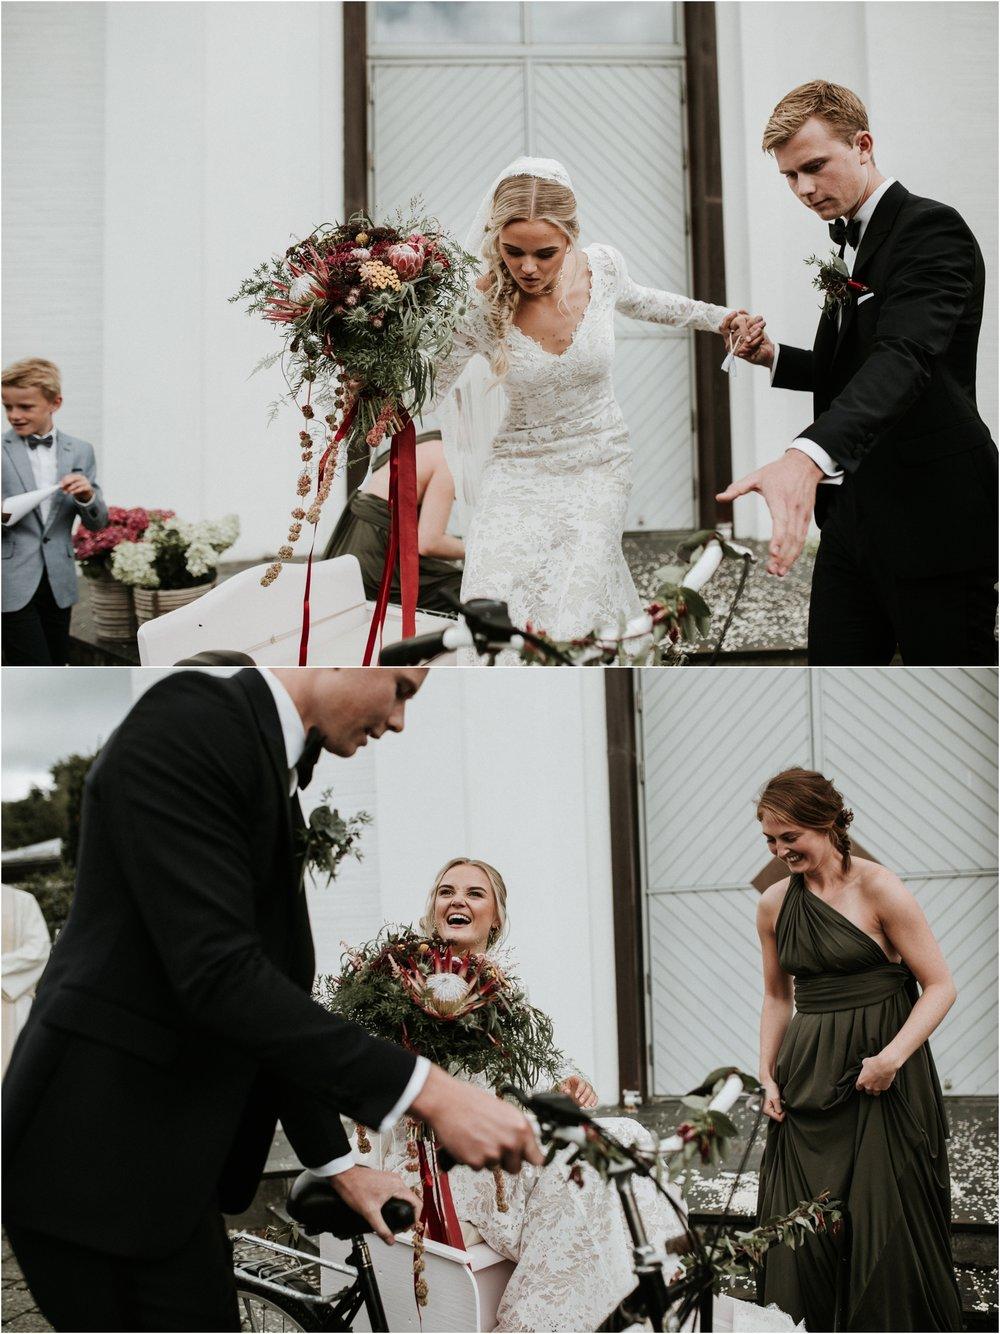 Norway-wedding-photographer-116.jpg